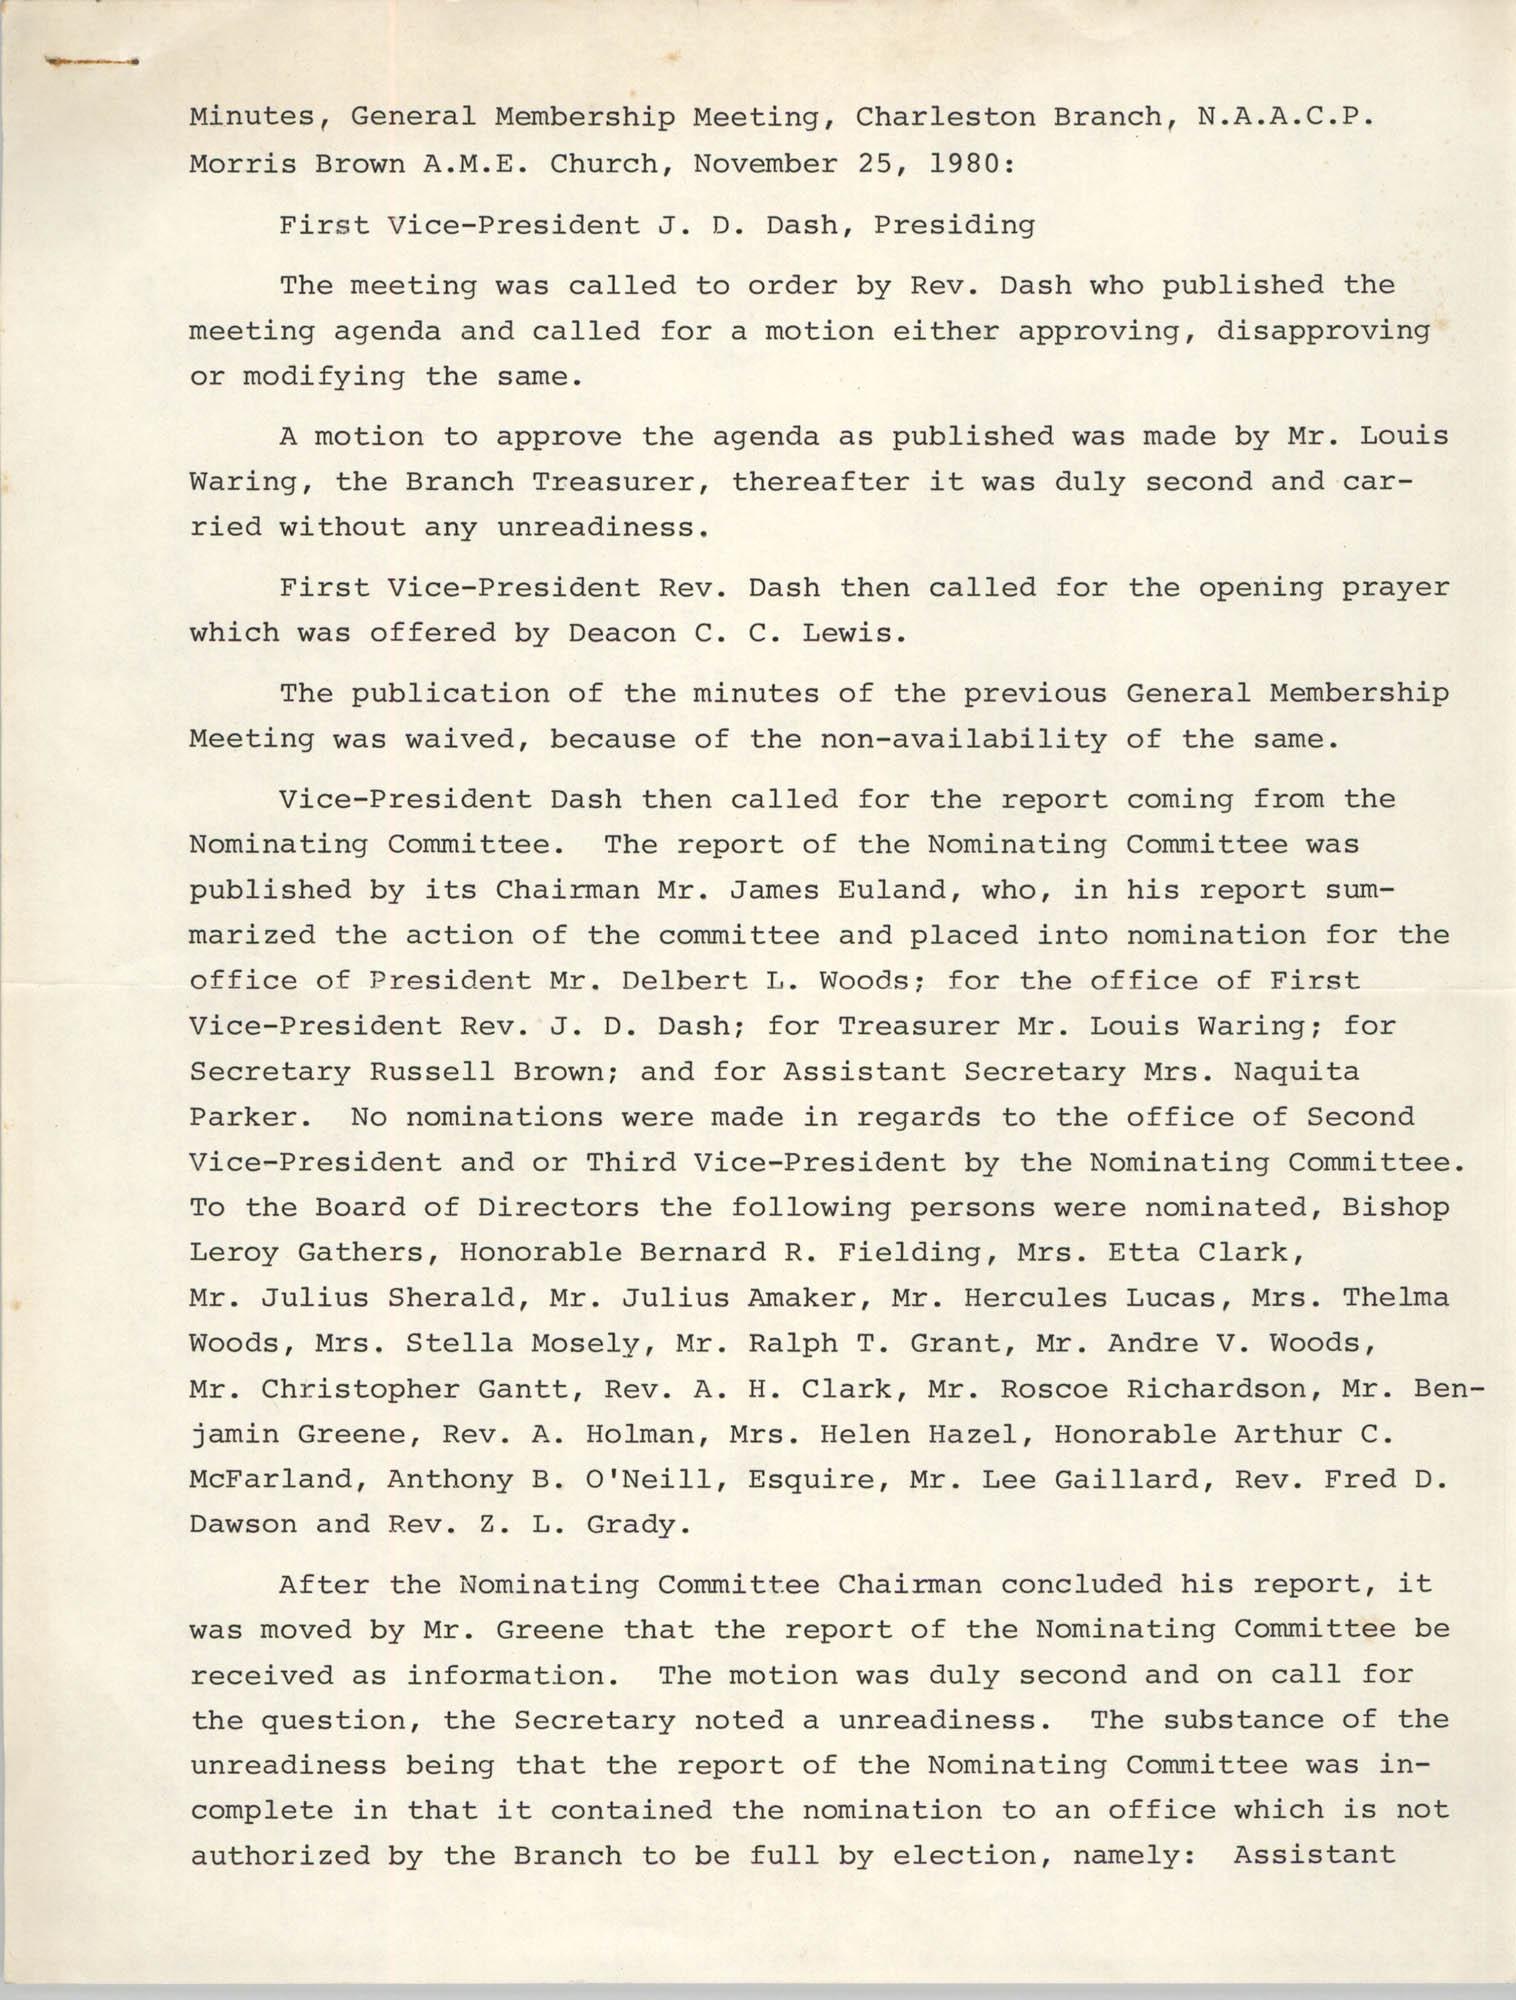 Minutes, General Membership Meeting, Charleston Branch, November 25, 1980